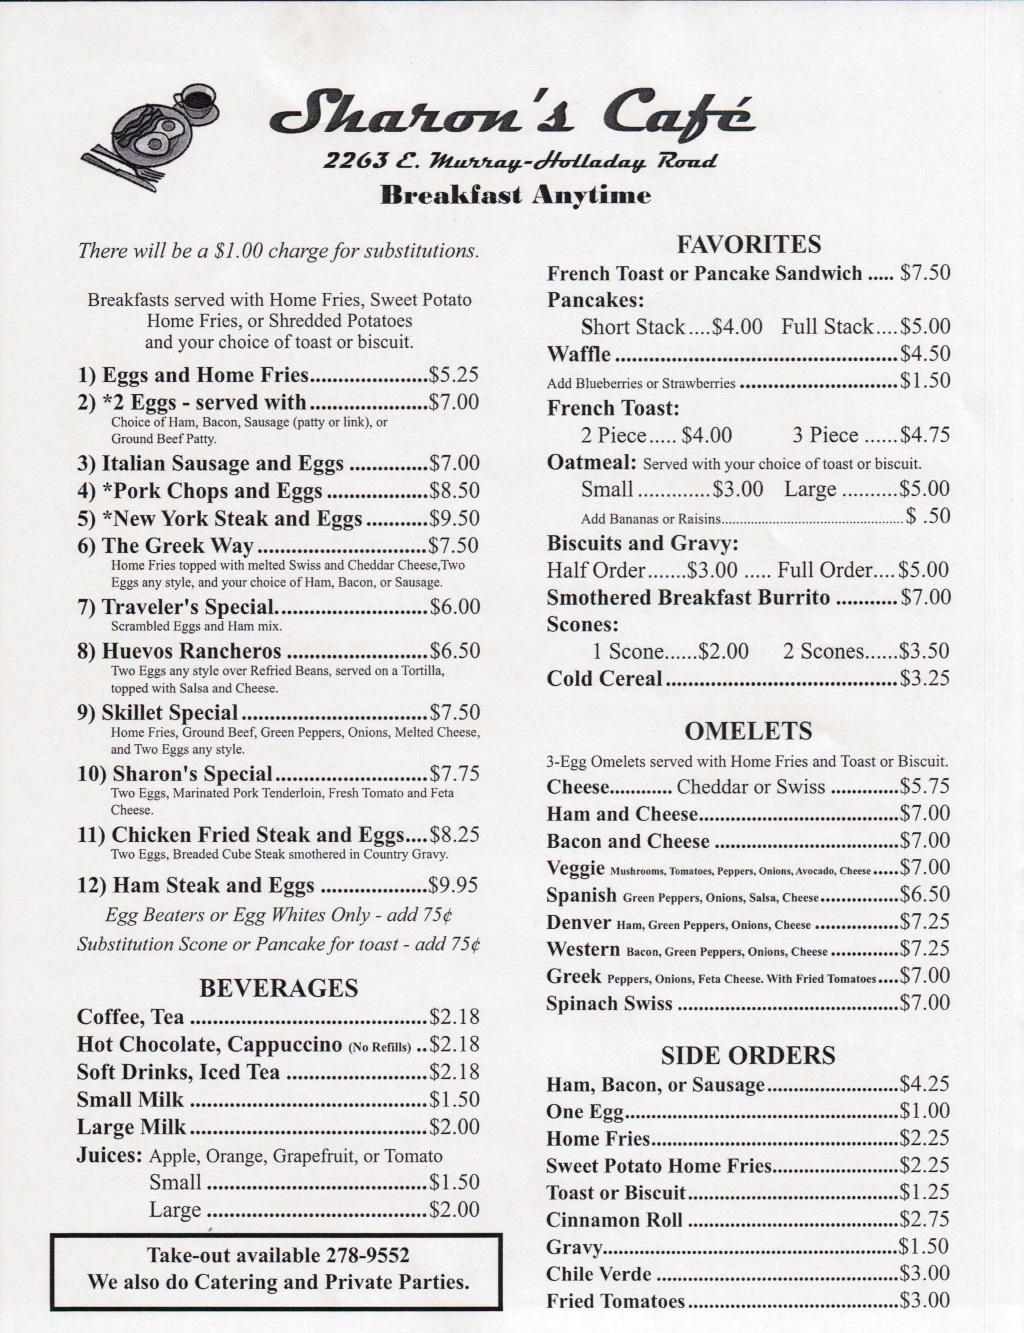 Lake Murray Cafe Menu